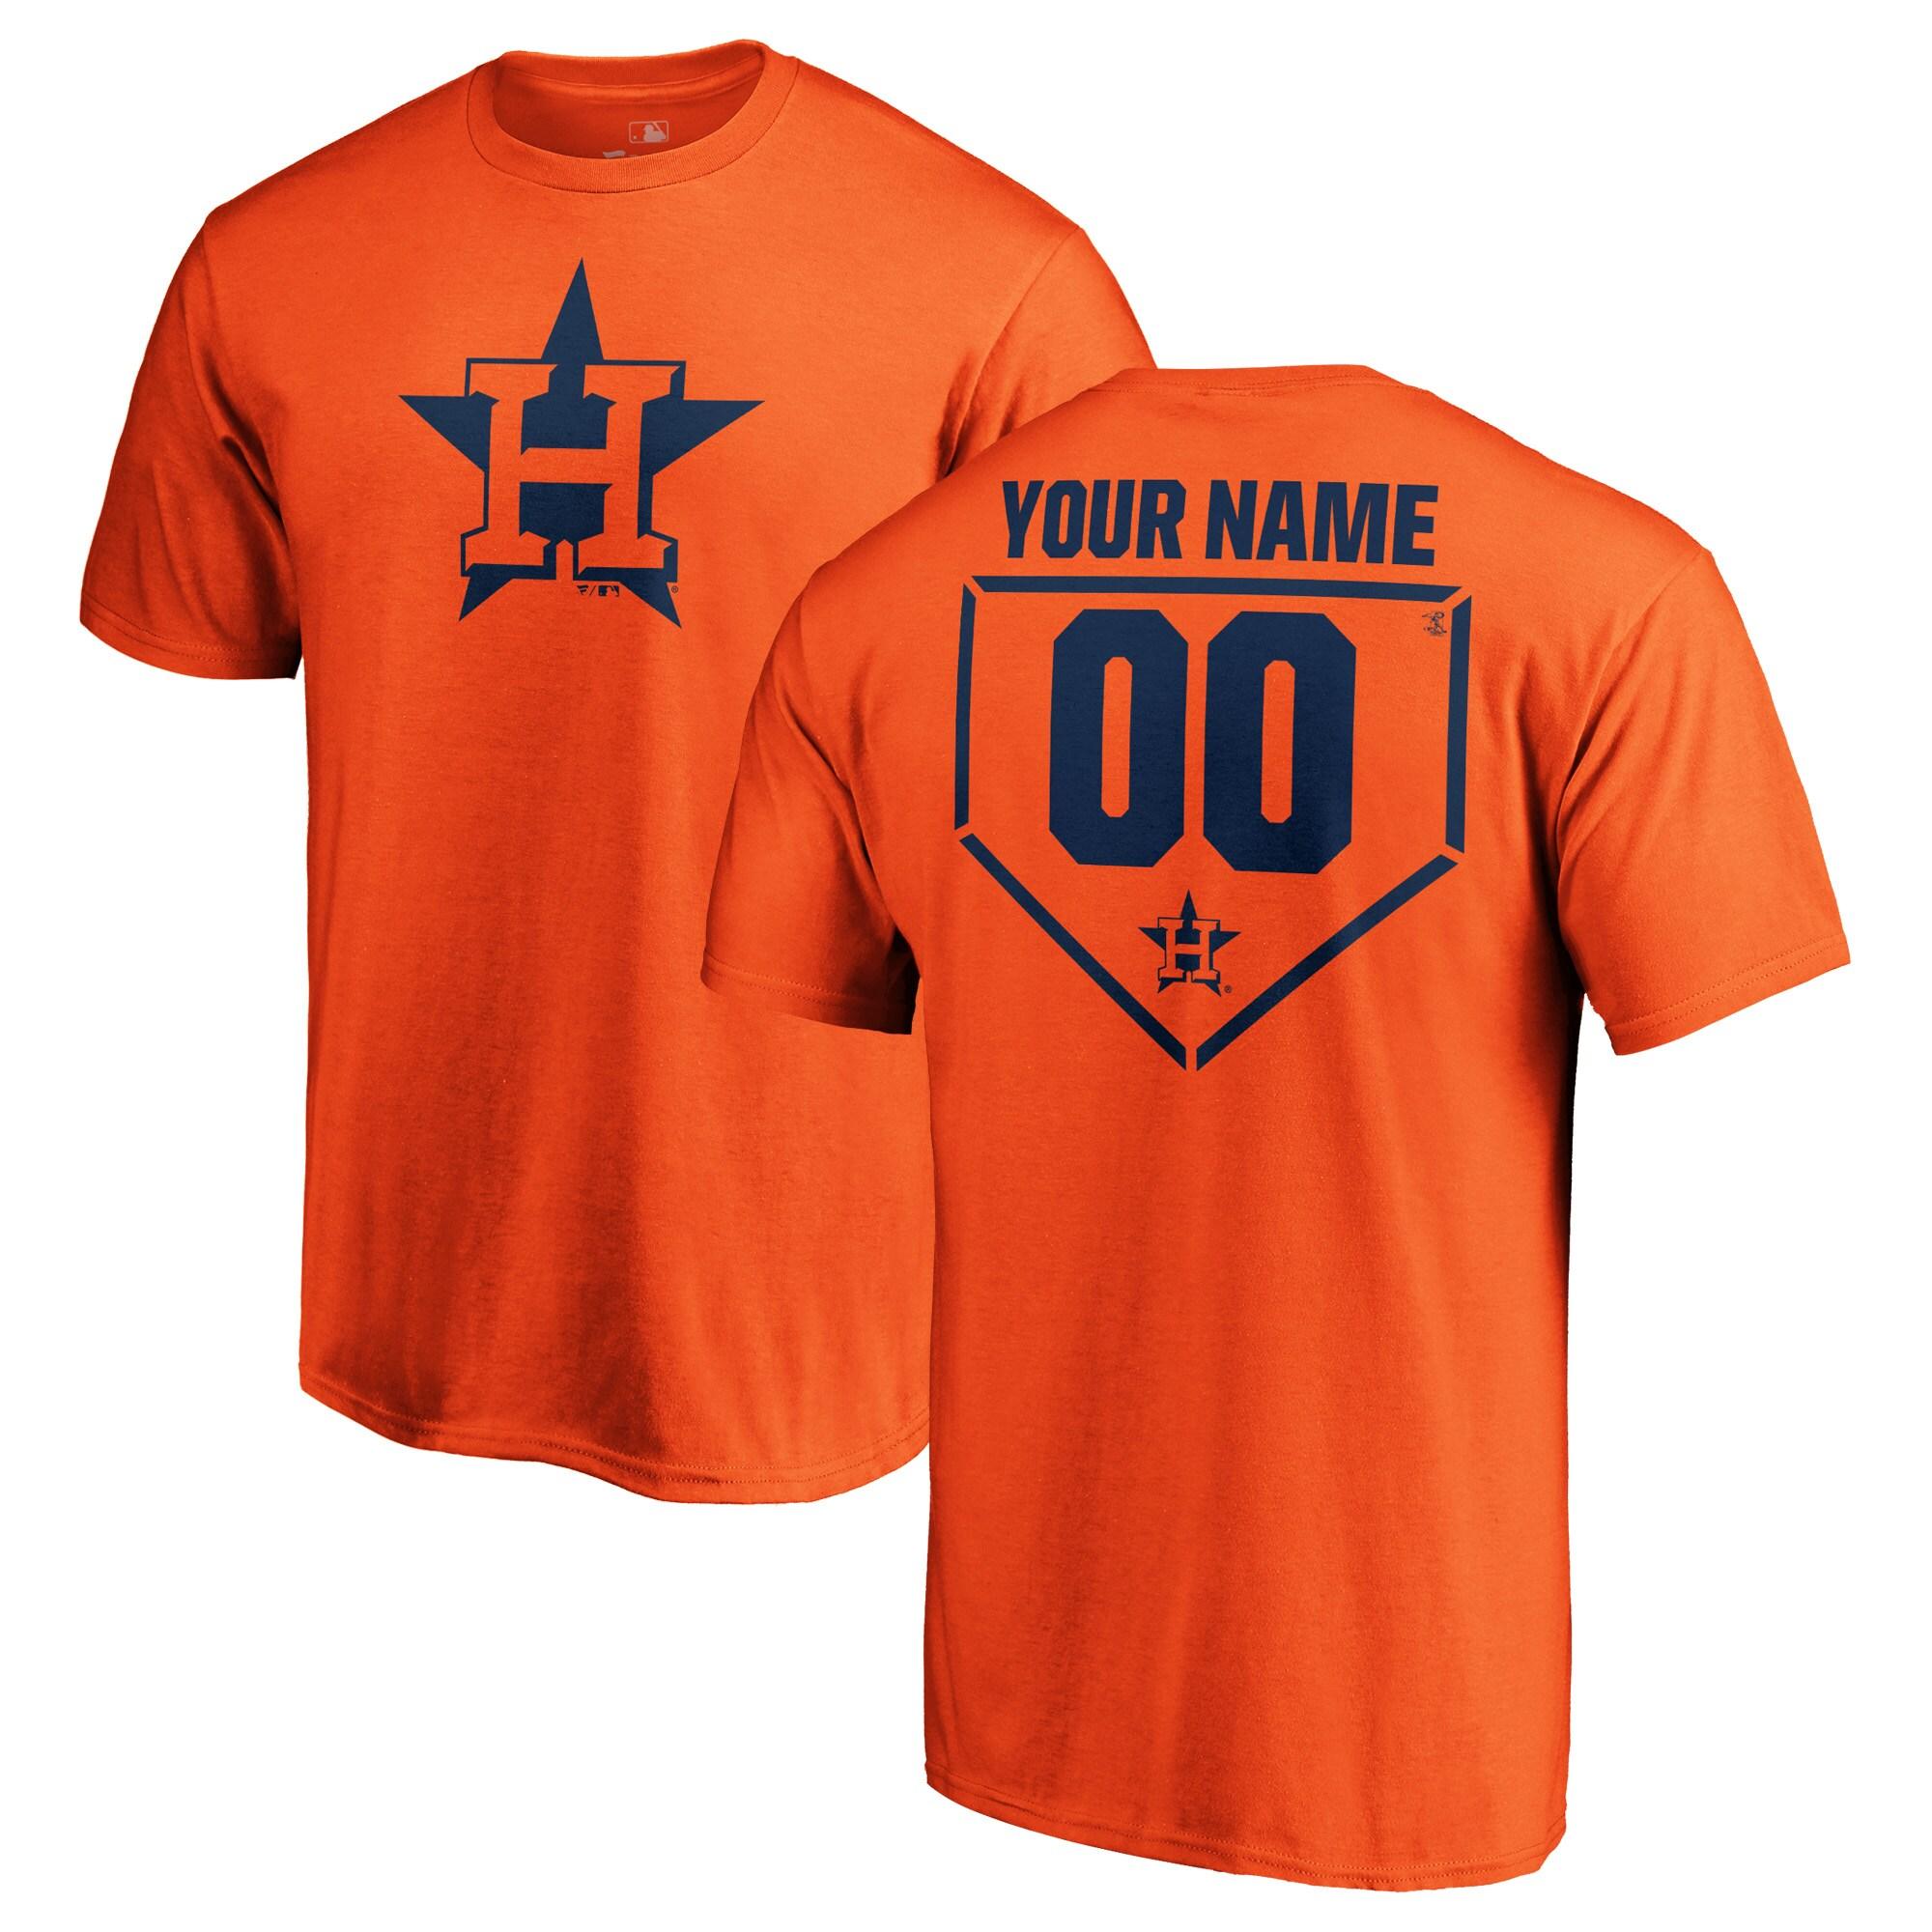 Houston Astros Fanatics Branded Personalized RBI T-Shirt - Orange